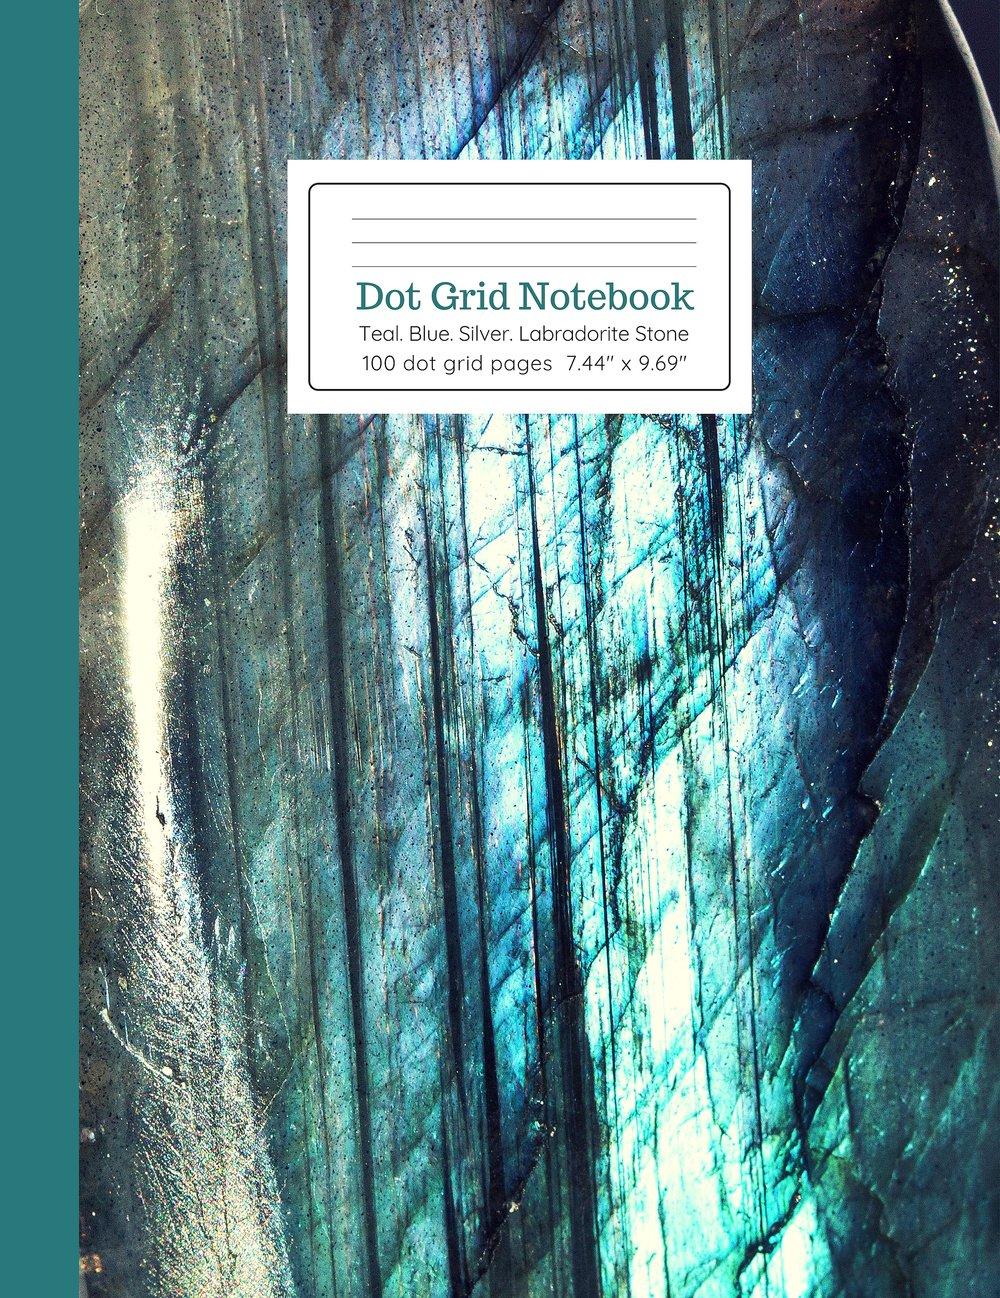 Dot Grid Notebook Teal Blue Silver Labradorite Stone